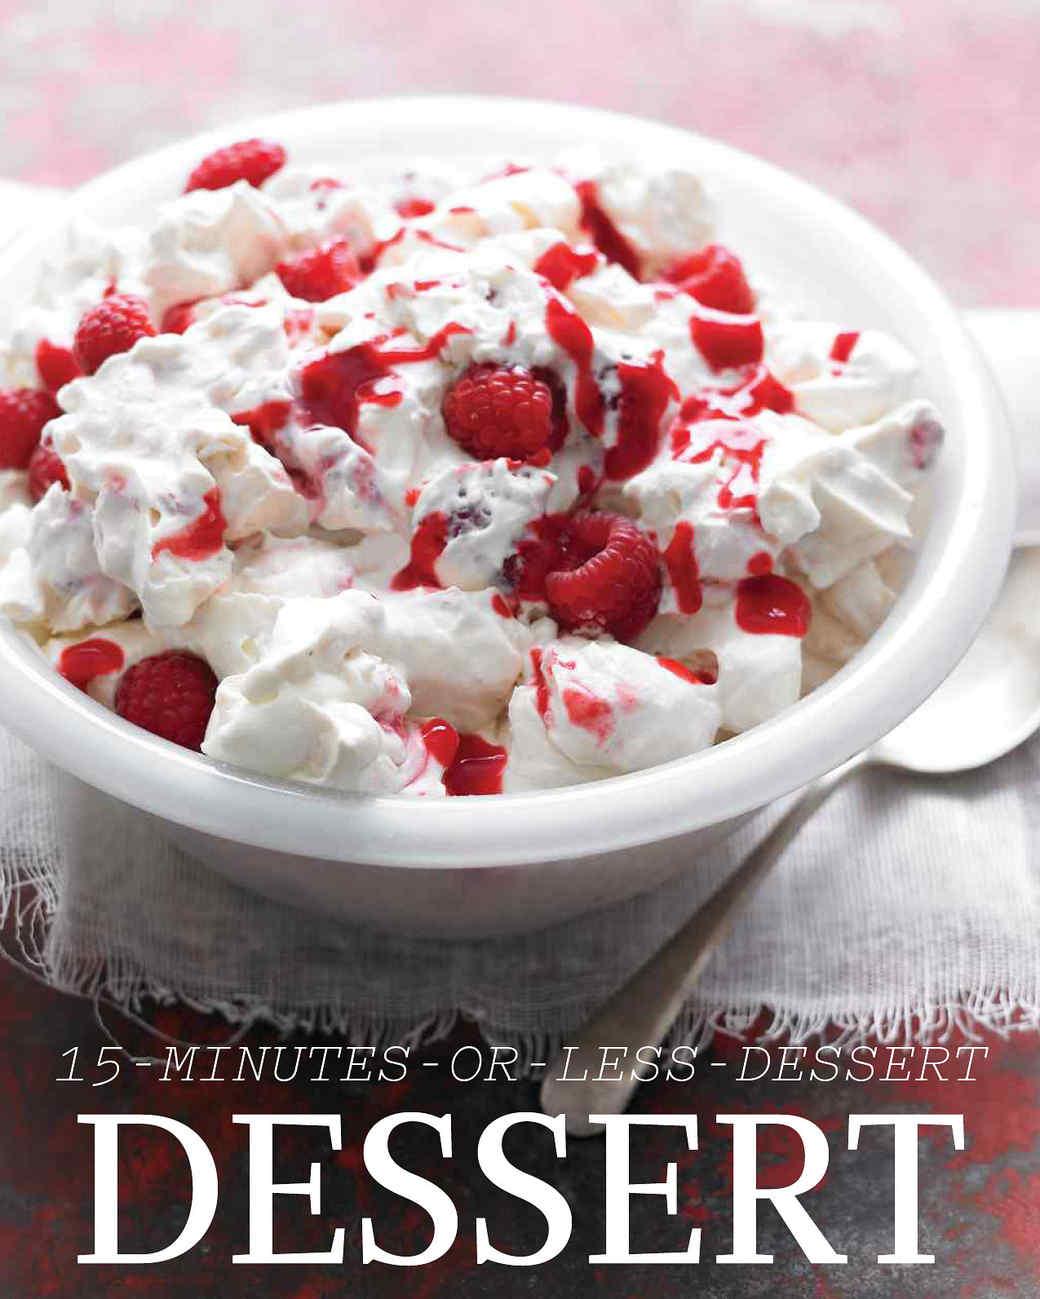 15-minutes-less-dessert.jpg